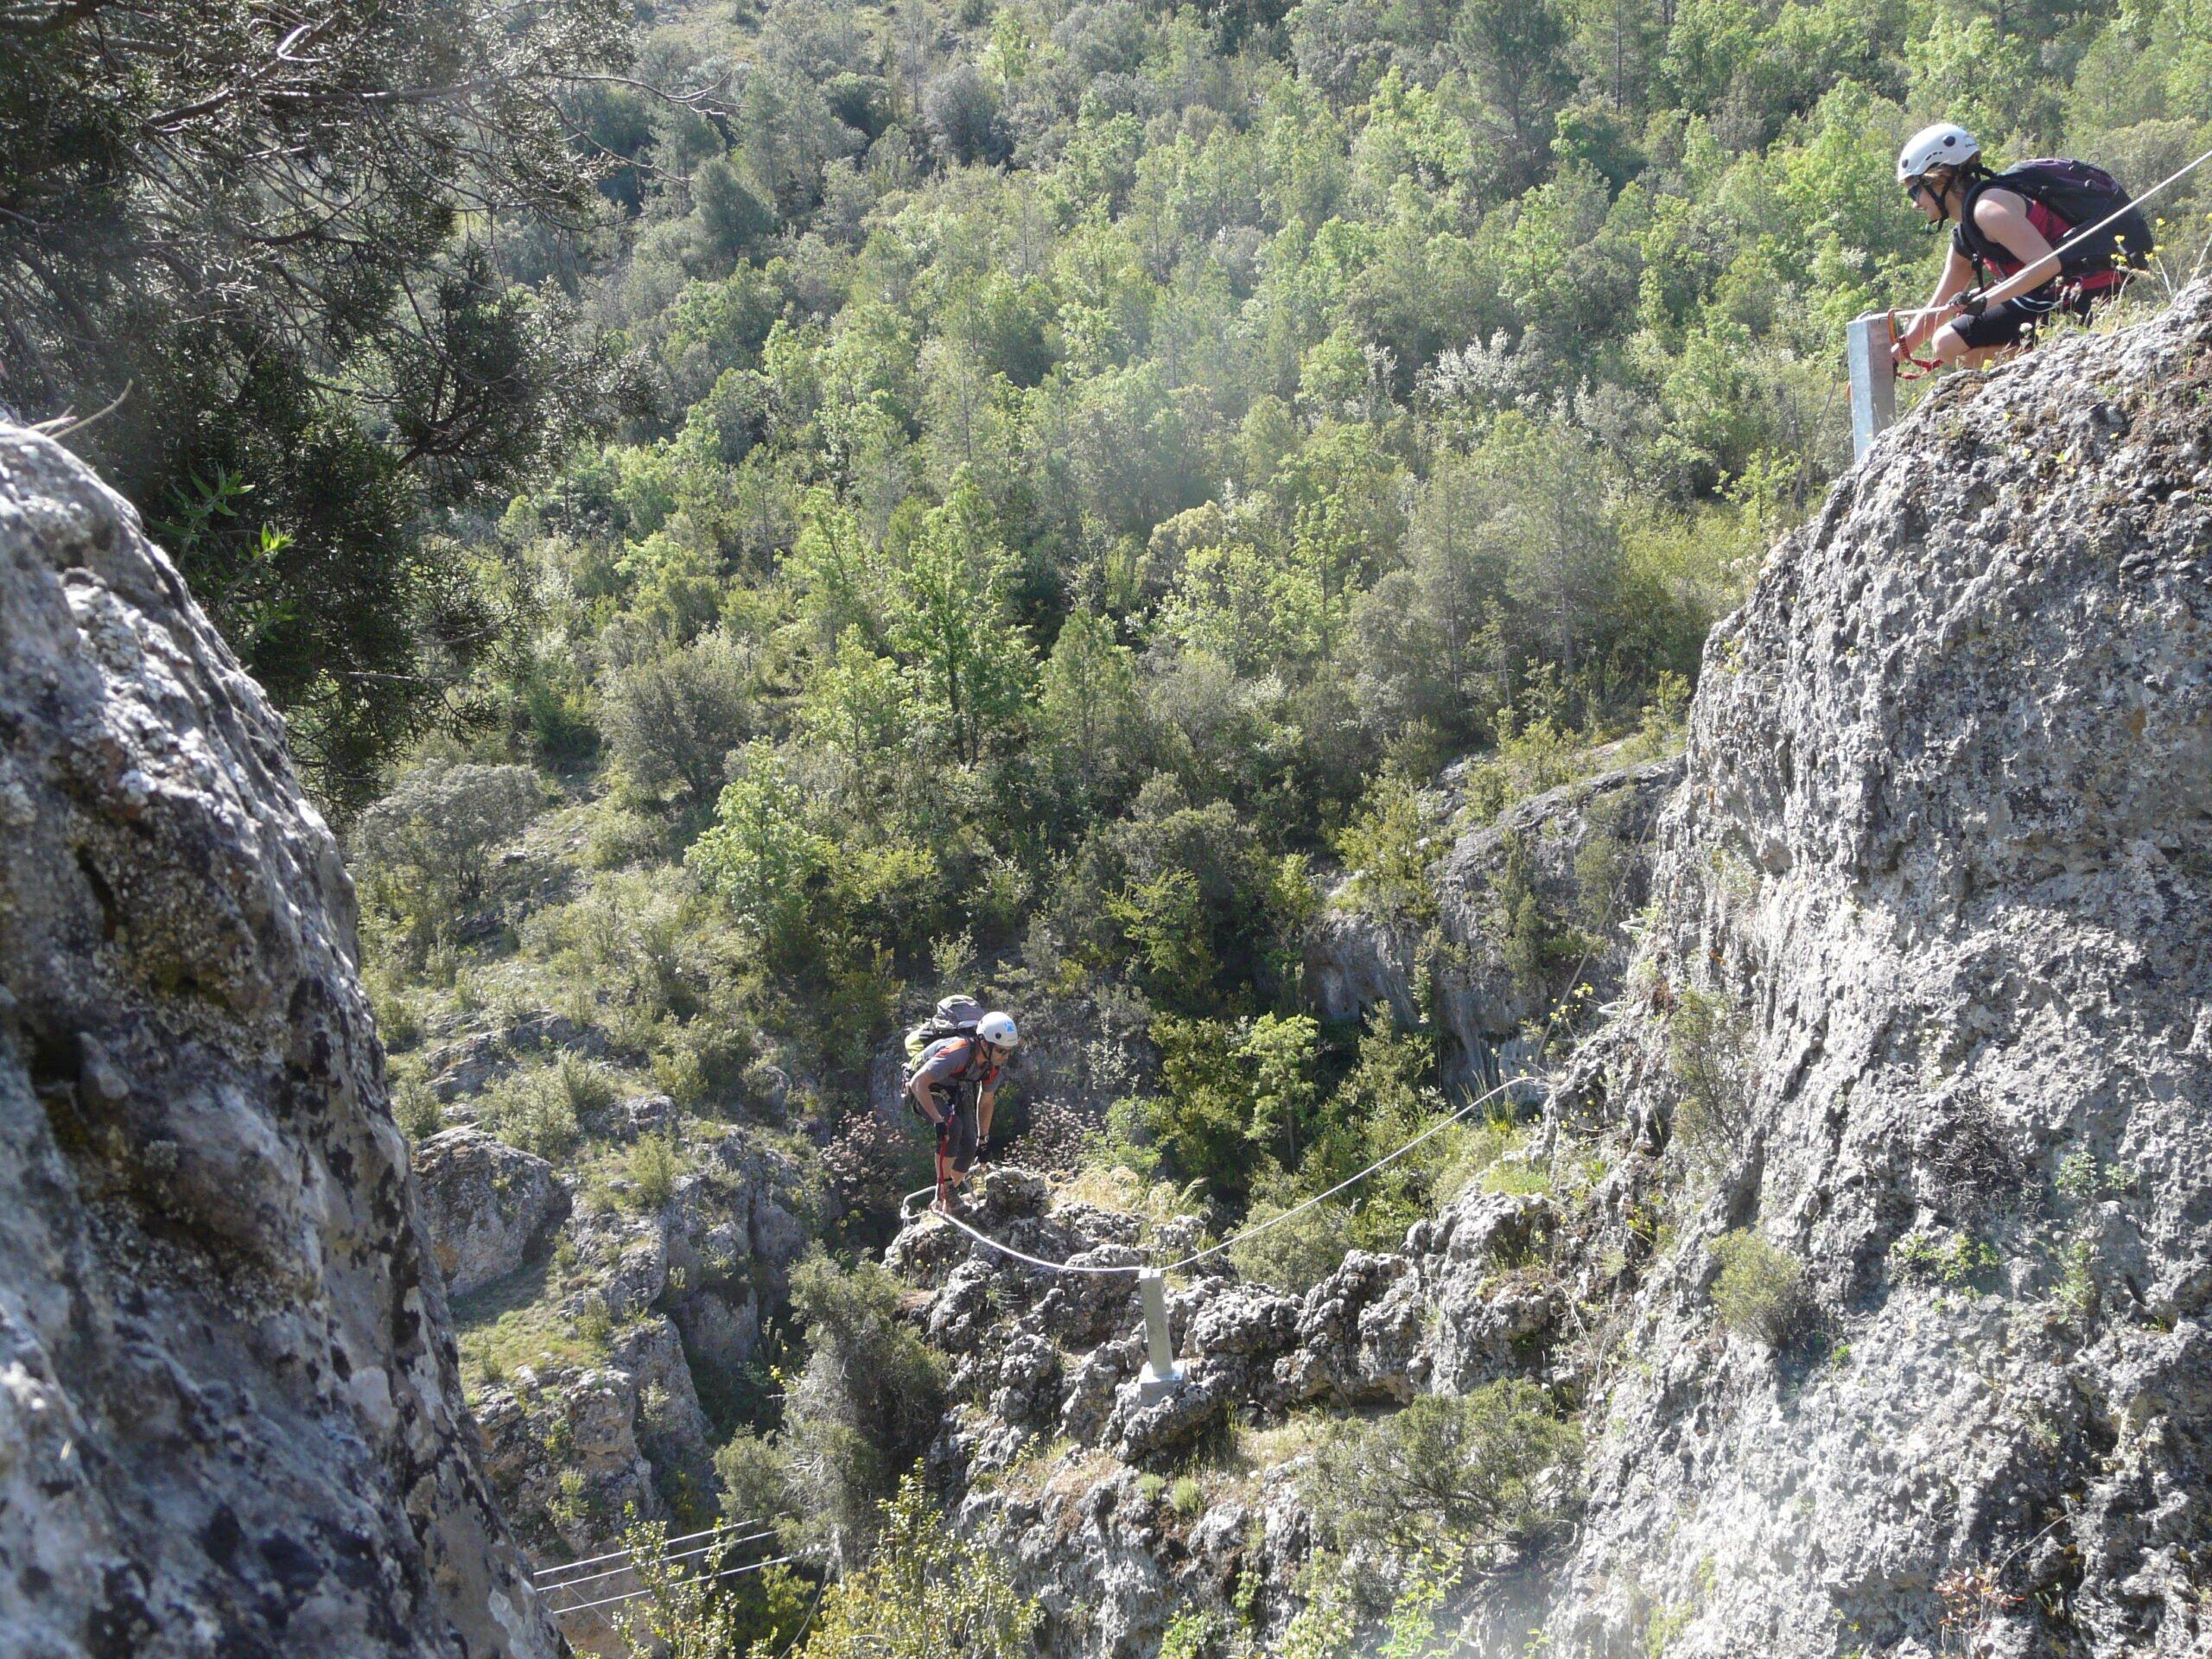 Cross Two Exciting Hanging Bridges In Our Via Ferrata Adventure Tour In Cuenca